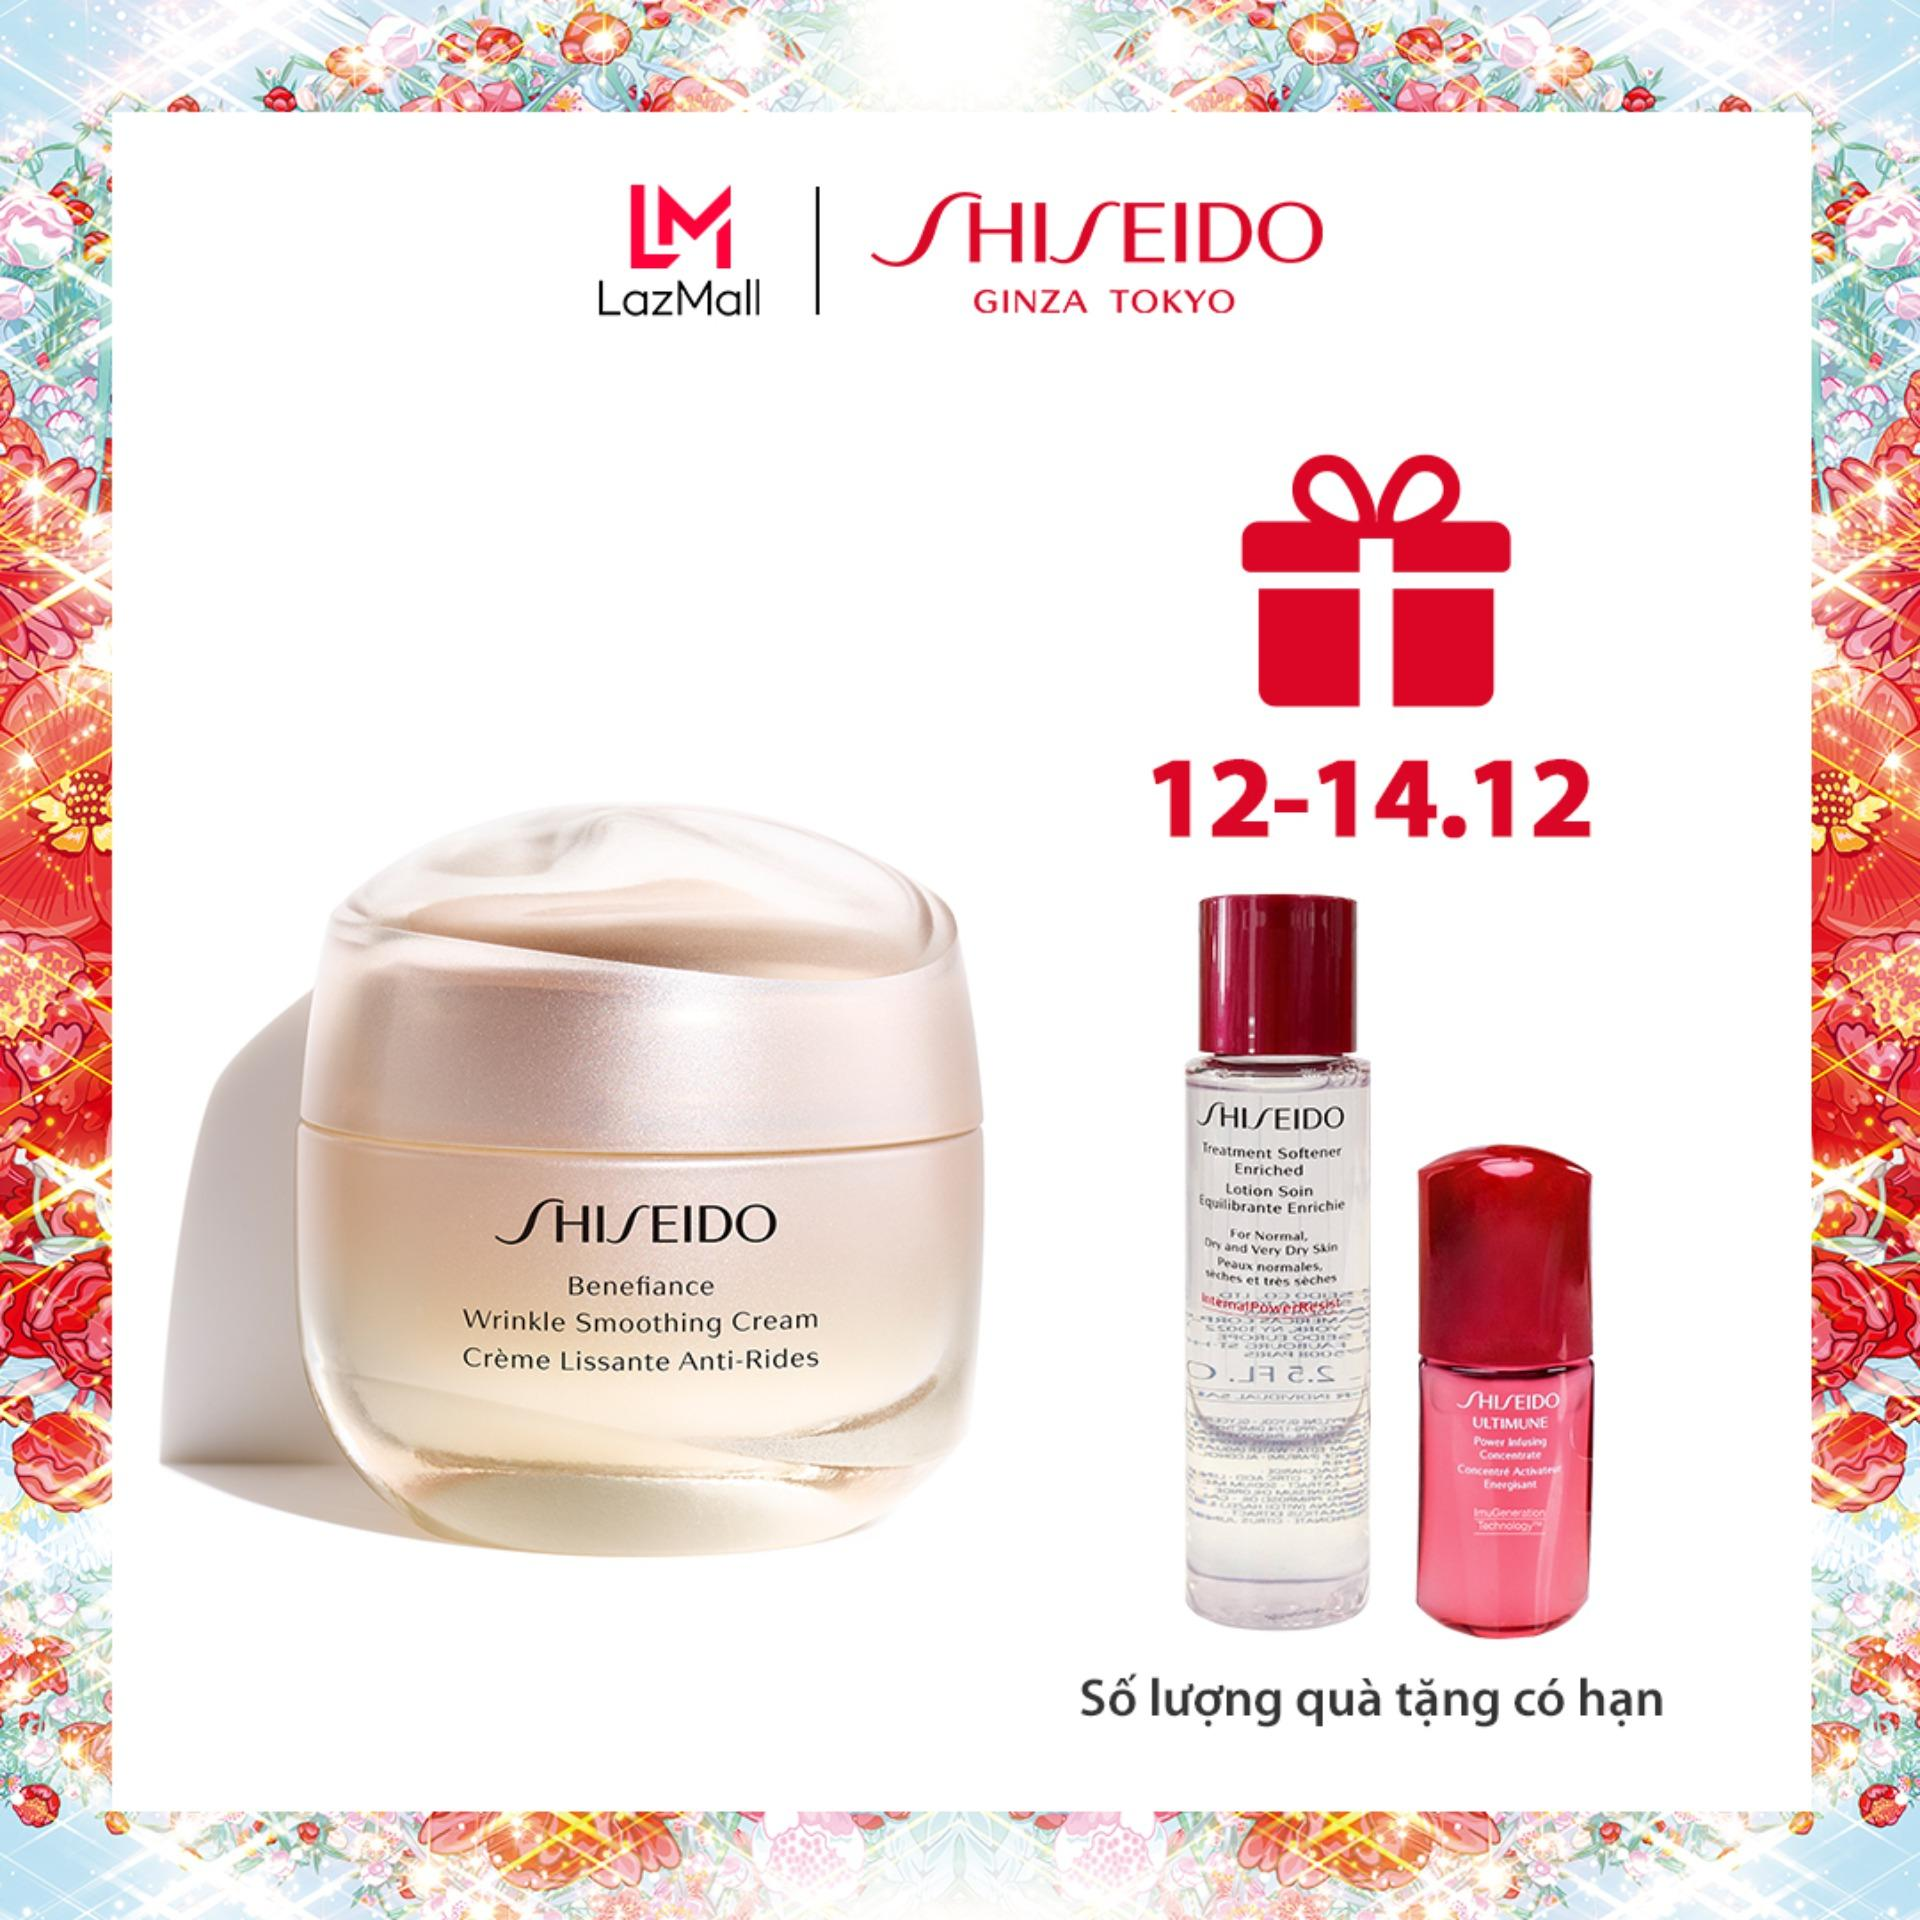 Bộ Kem Chống Lão Hóa Shiseido Benefiance Wrinkle Smoothing Cream 50ml Giá Cực Ngầu